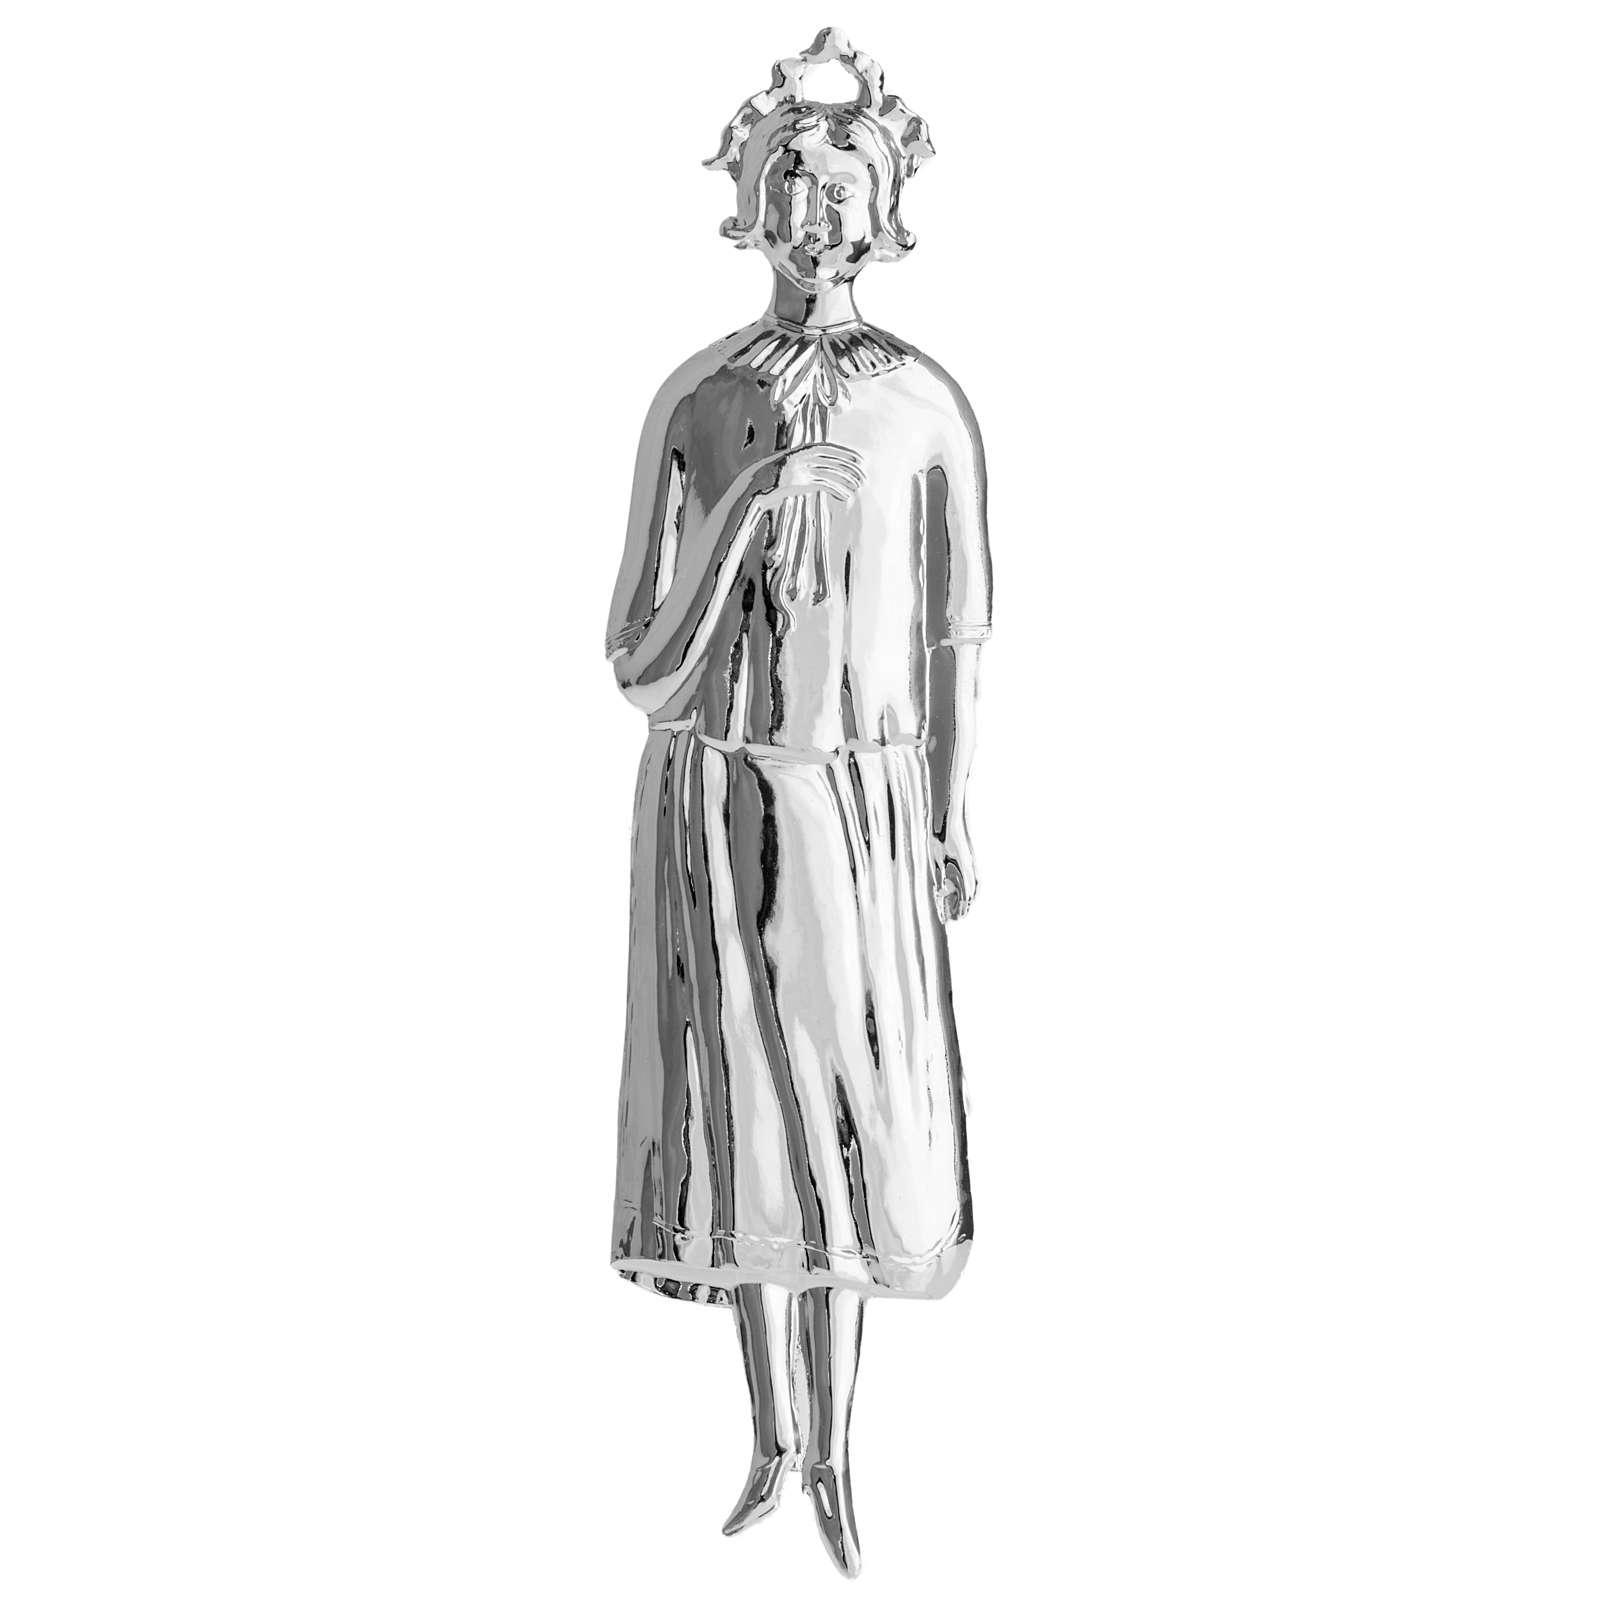 Ex-voto mujer plata 925 o metal 20 cm. 3